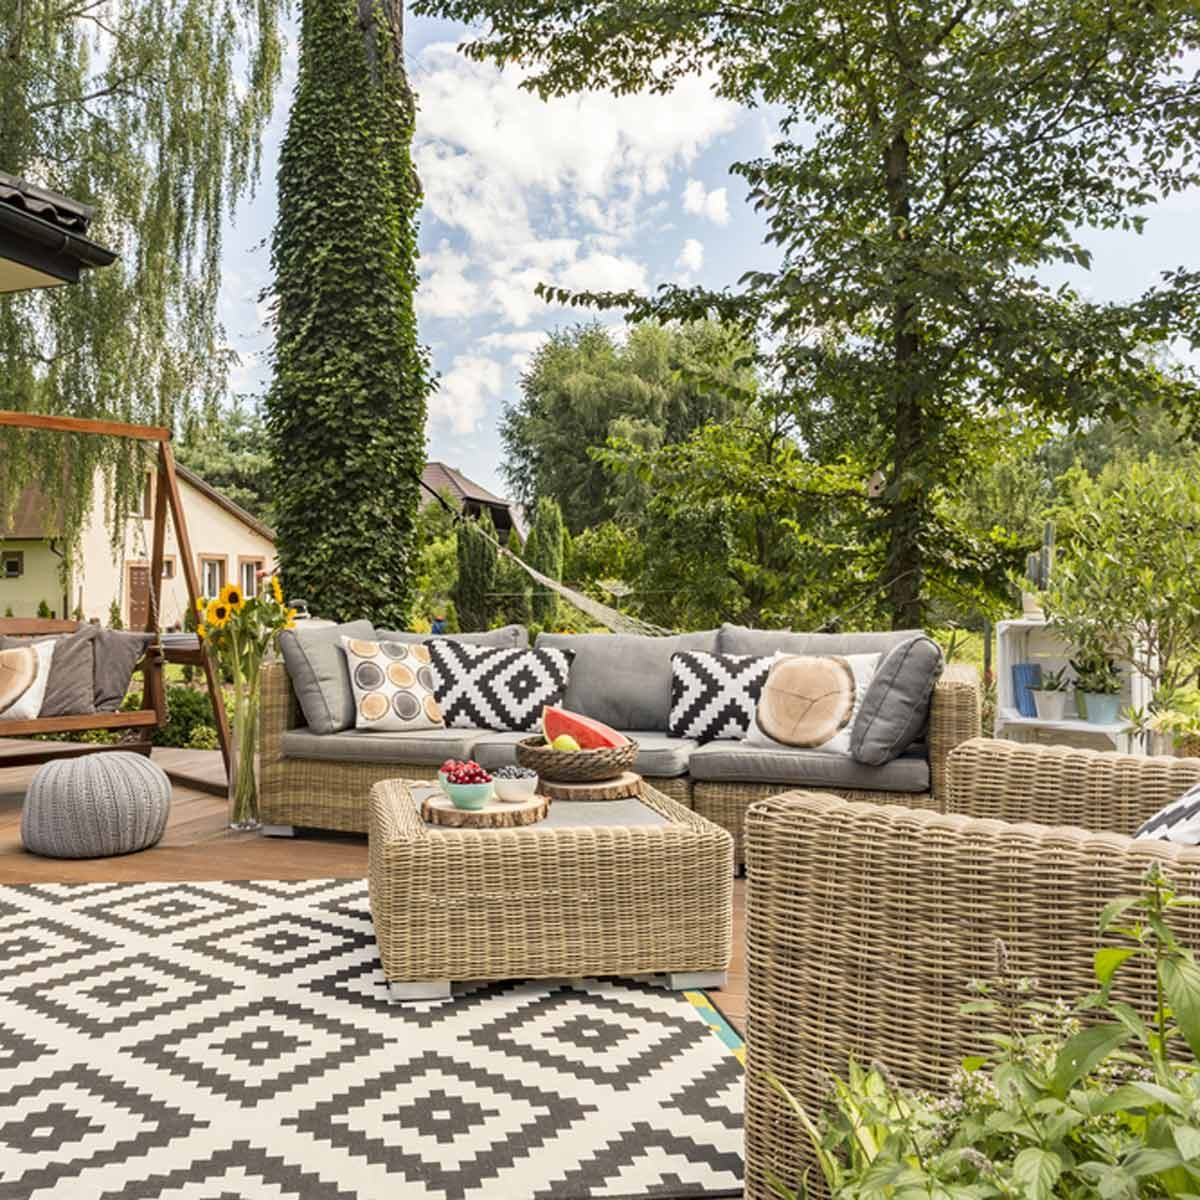 chevron patterned patio decor